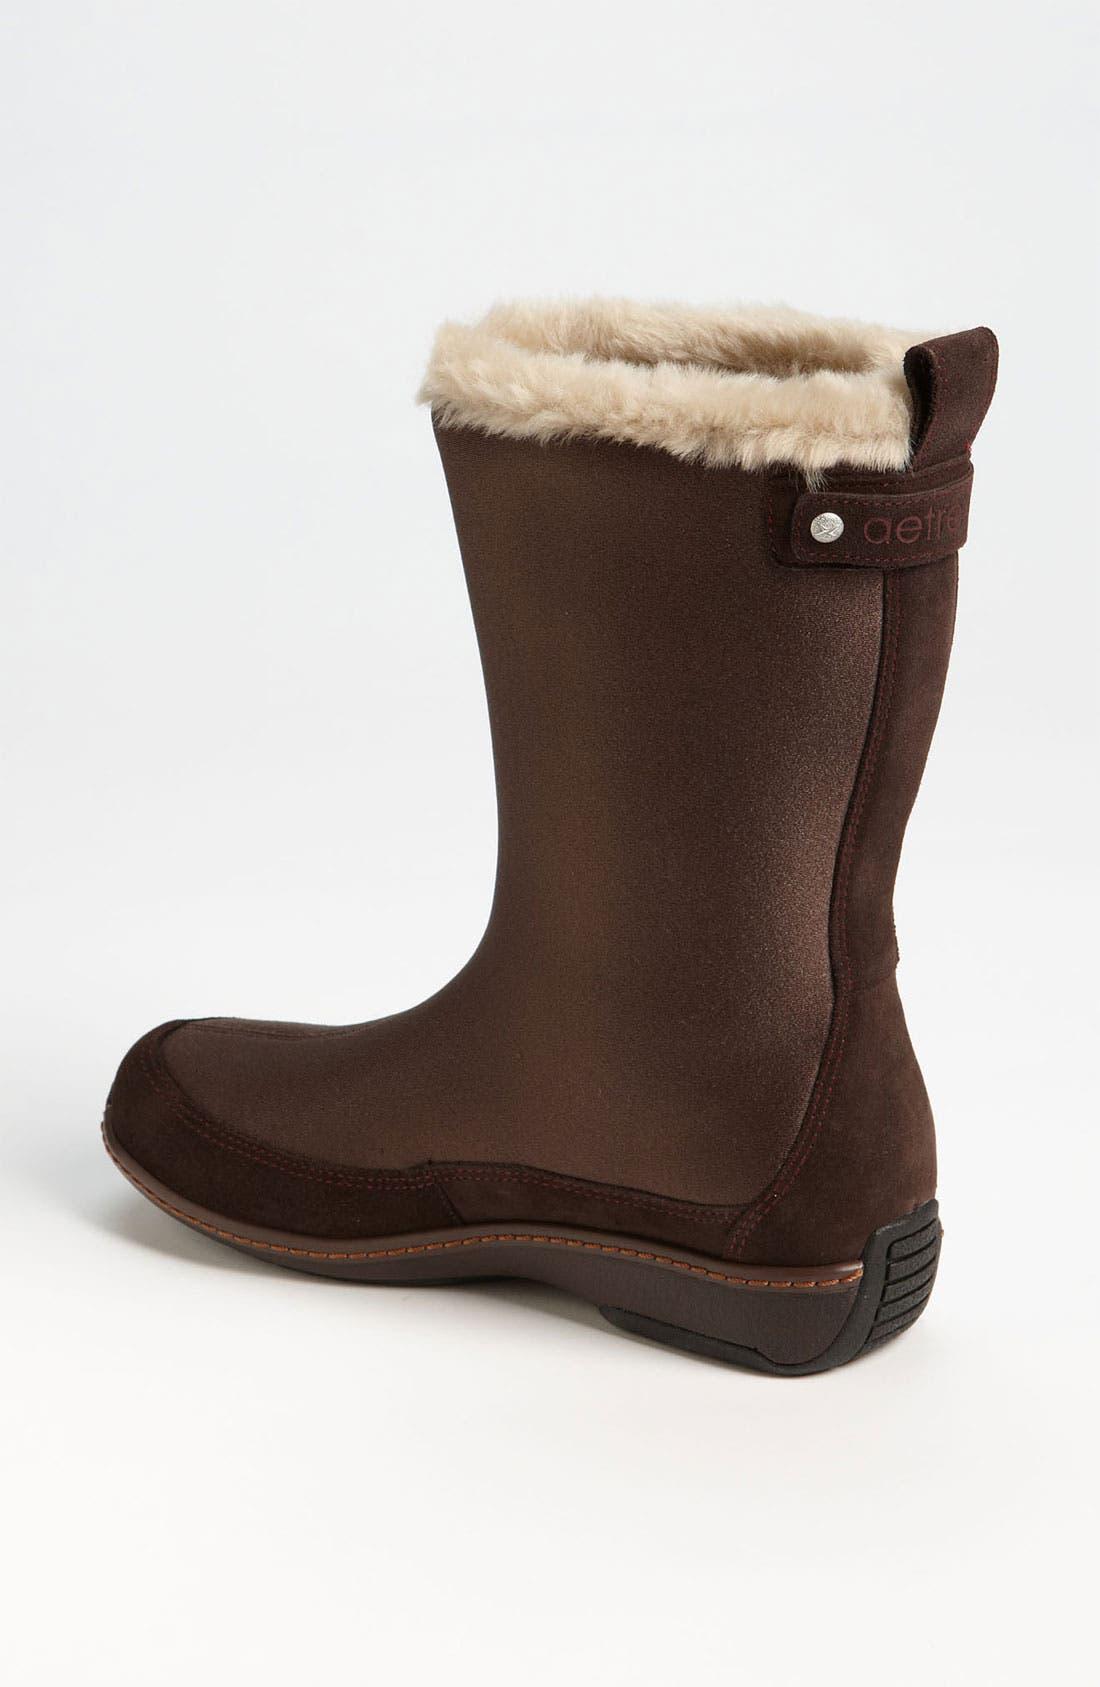 Alternate Image 2  - Aetrex 'Furry' Mid Calf Boot